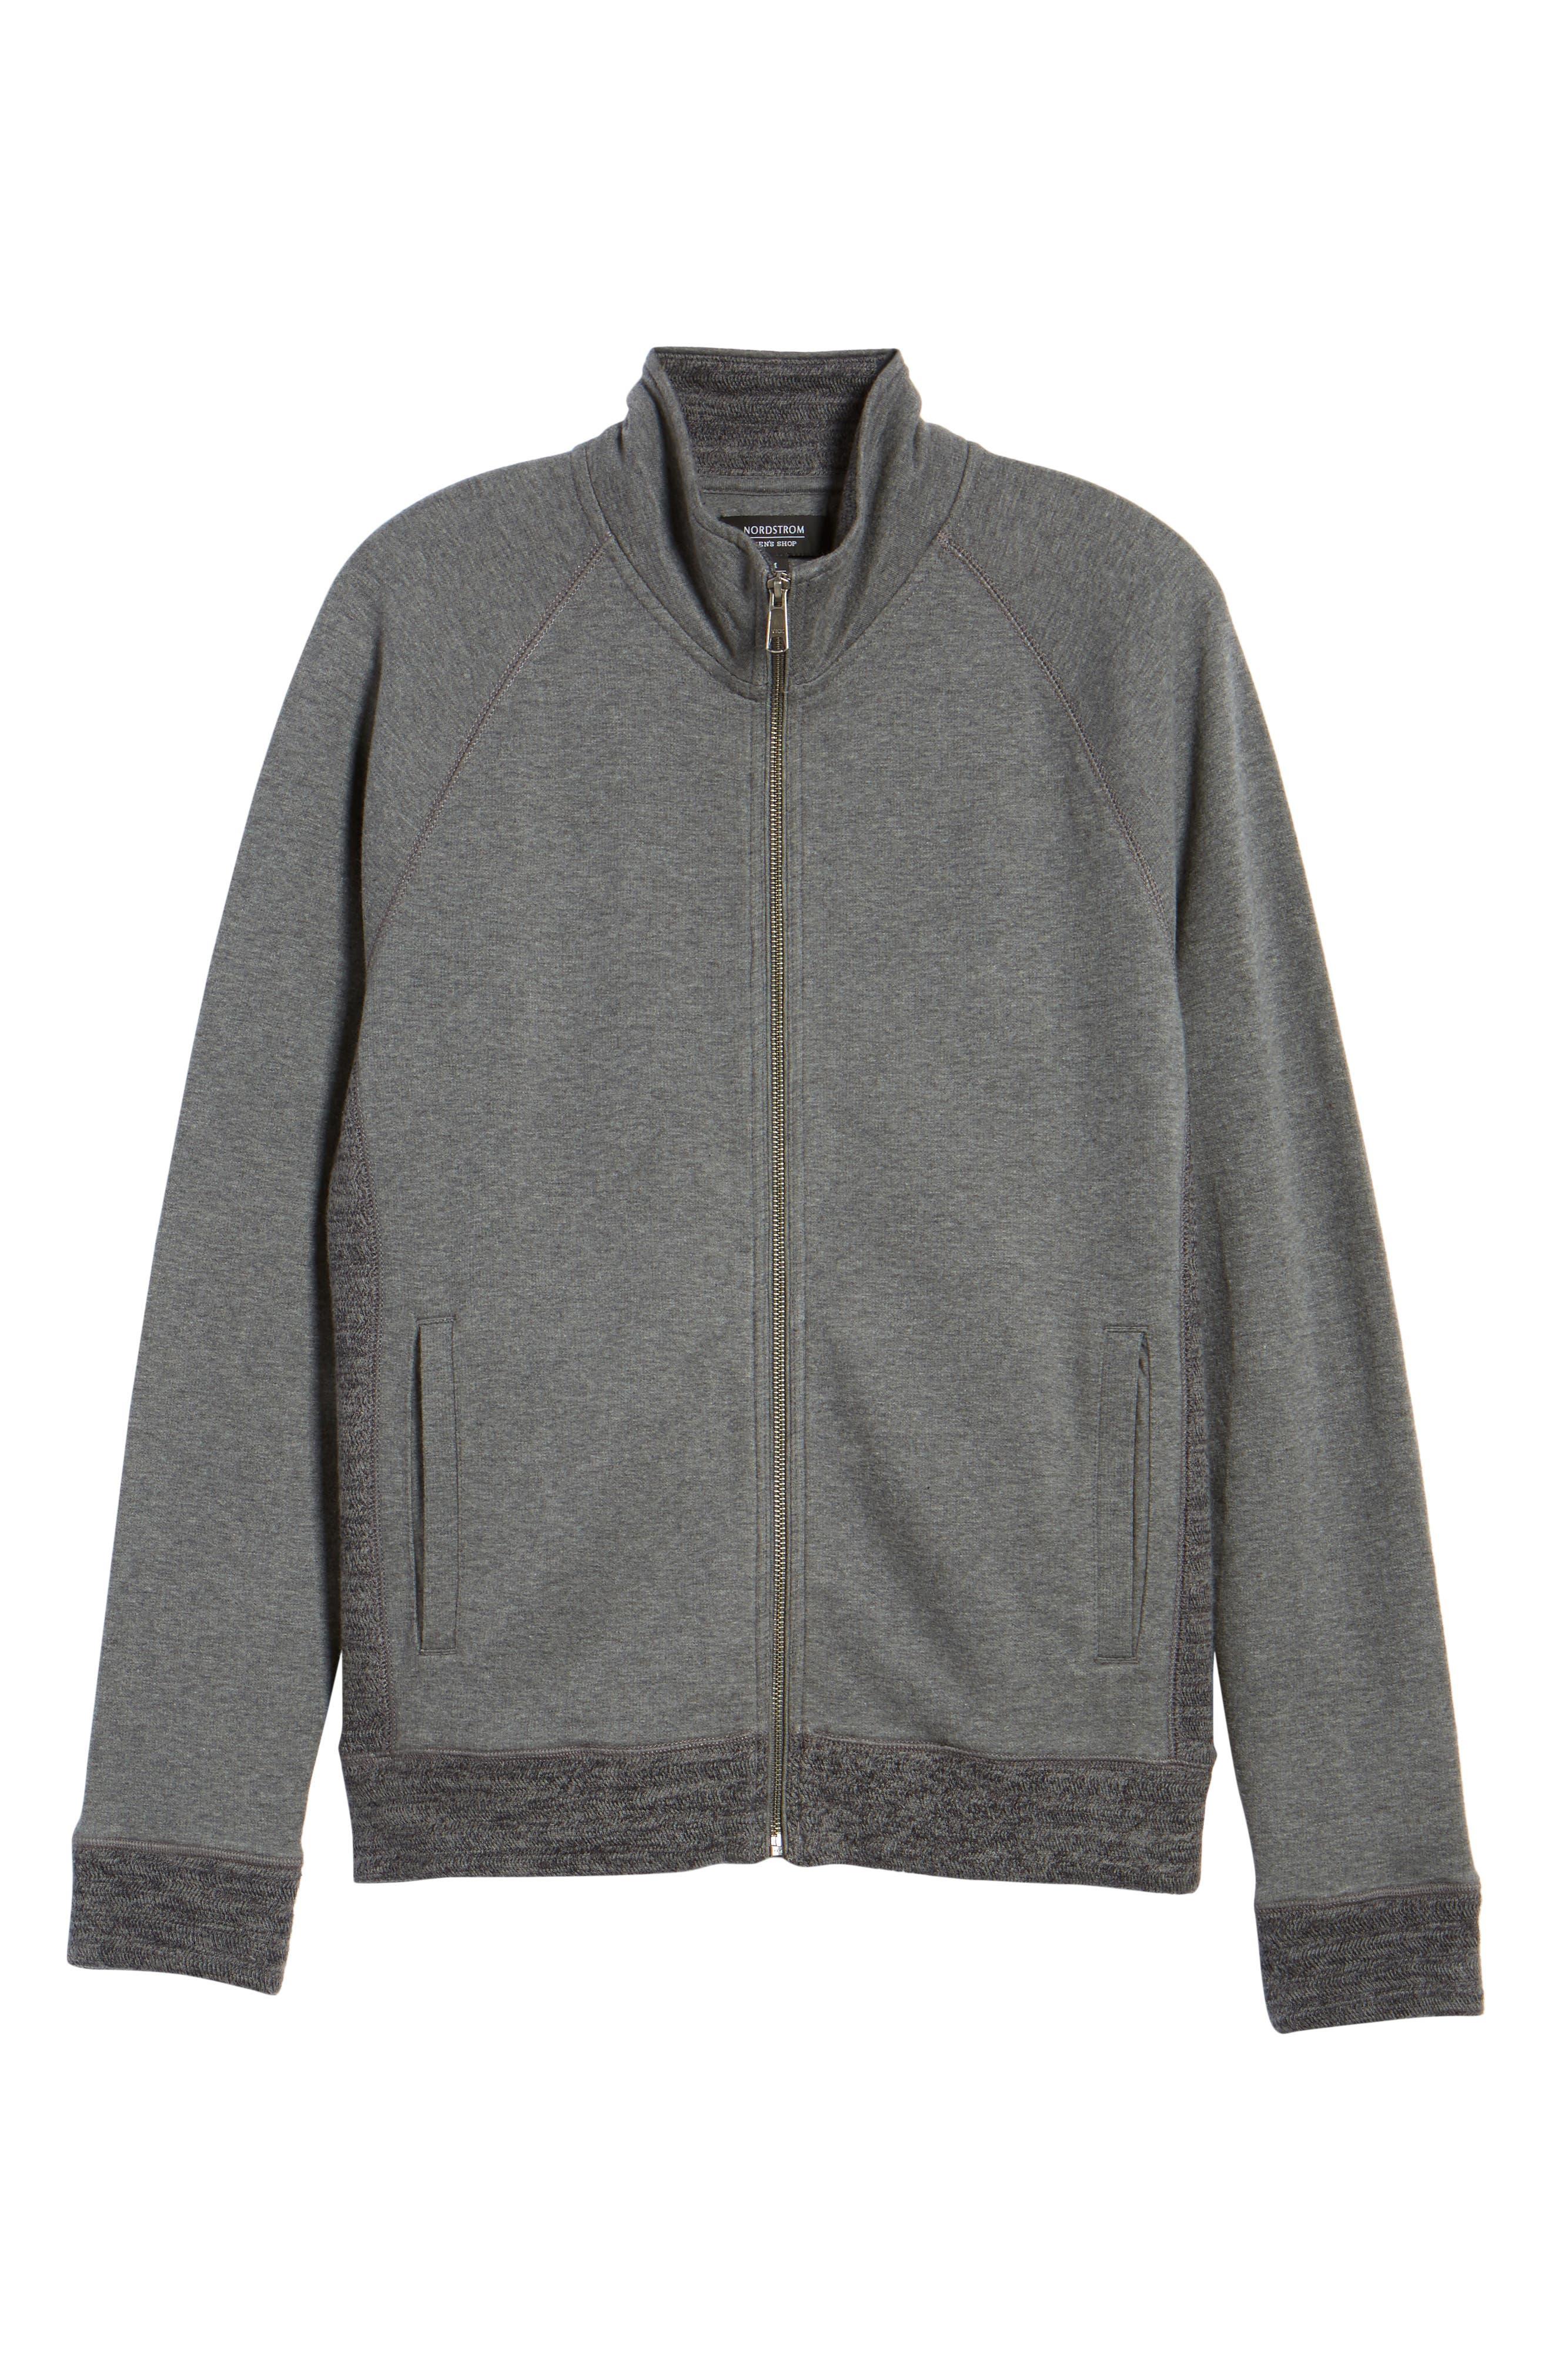 Full Zip Fleece Jacket,                             Alternate thumbnail 6, color,                             021